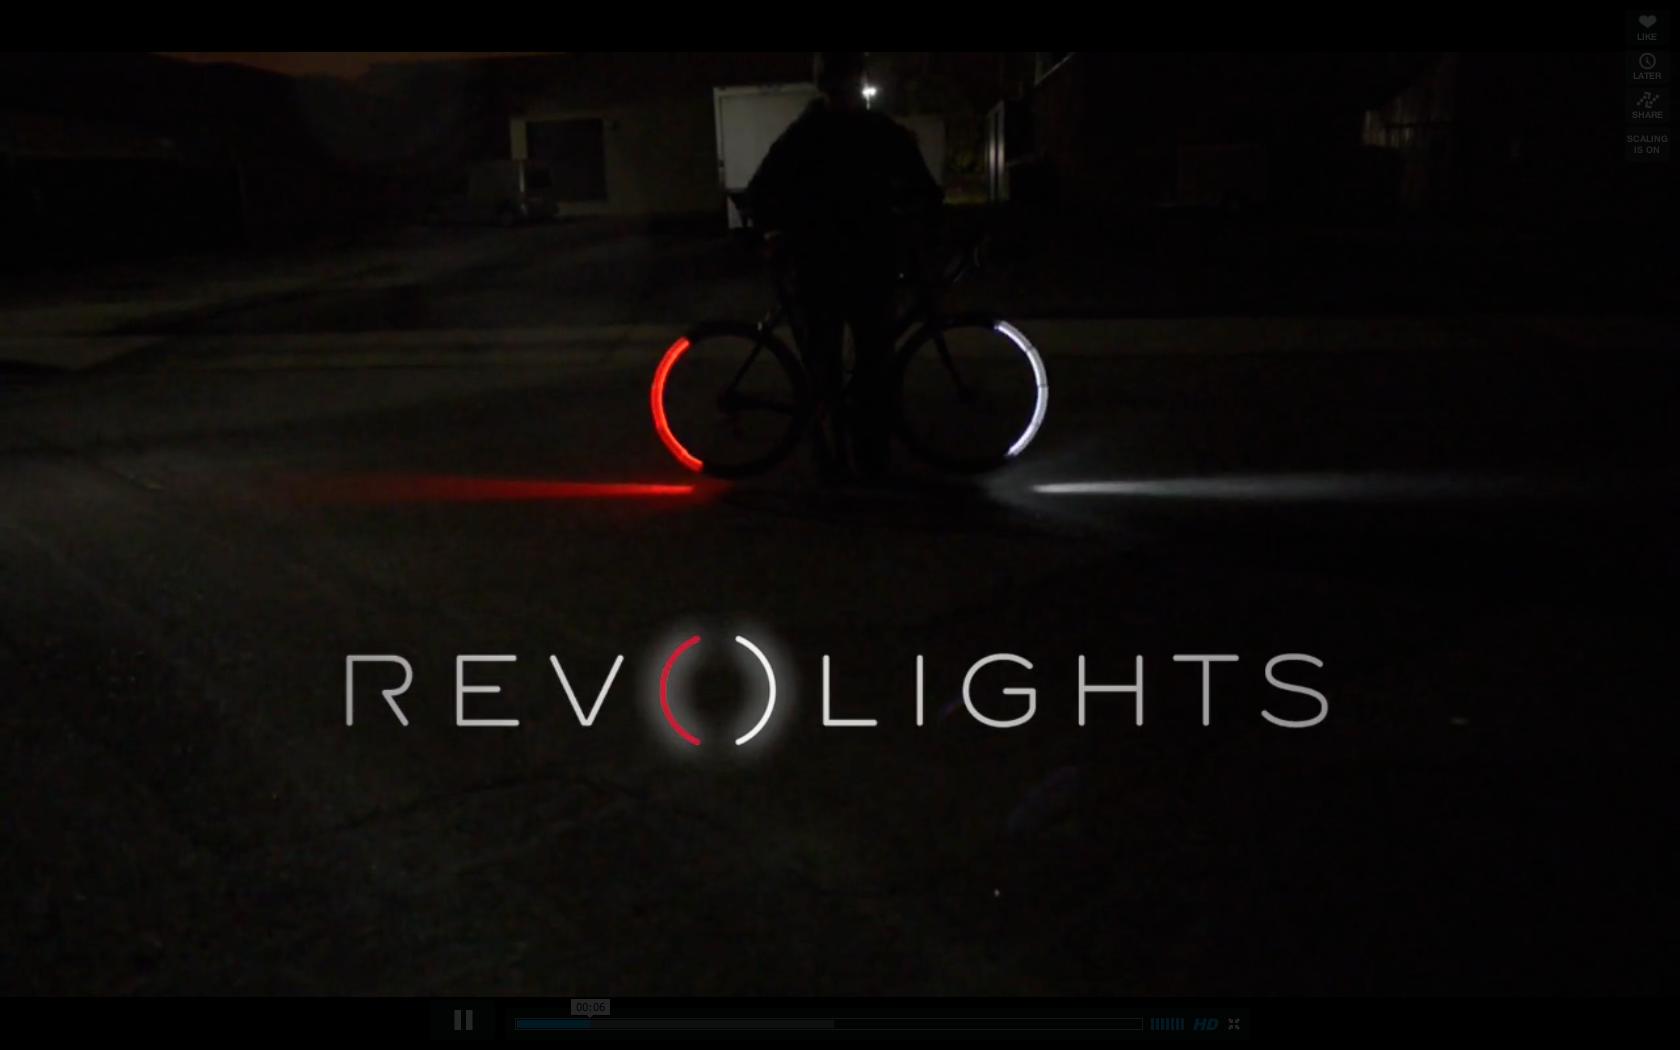 revolights fahrradbeleuchtung im tron stil rennrad news. Black Bedroom Furniture Sets. Home Design Ideas